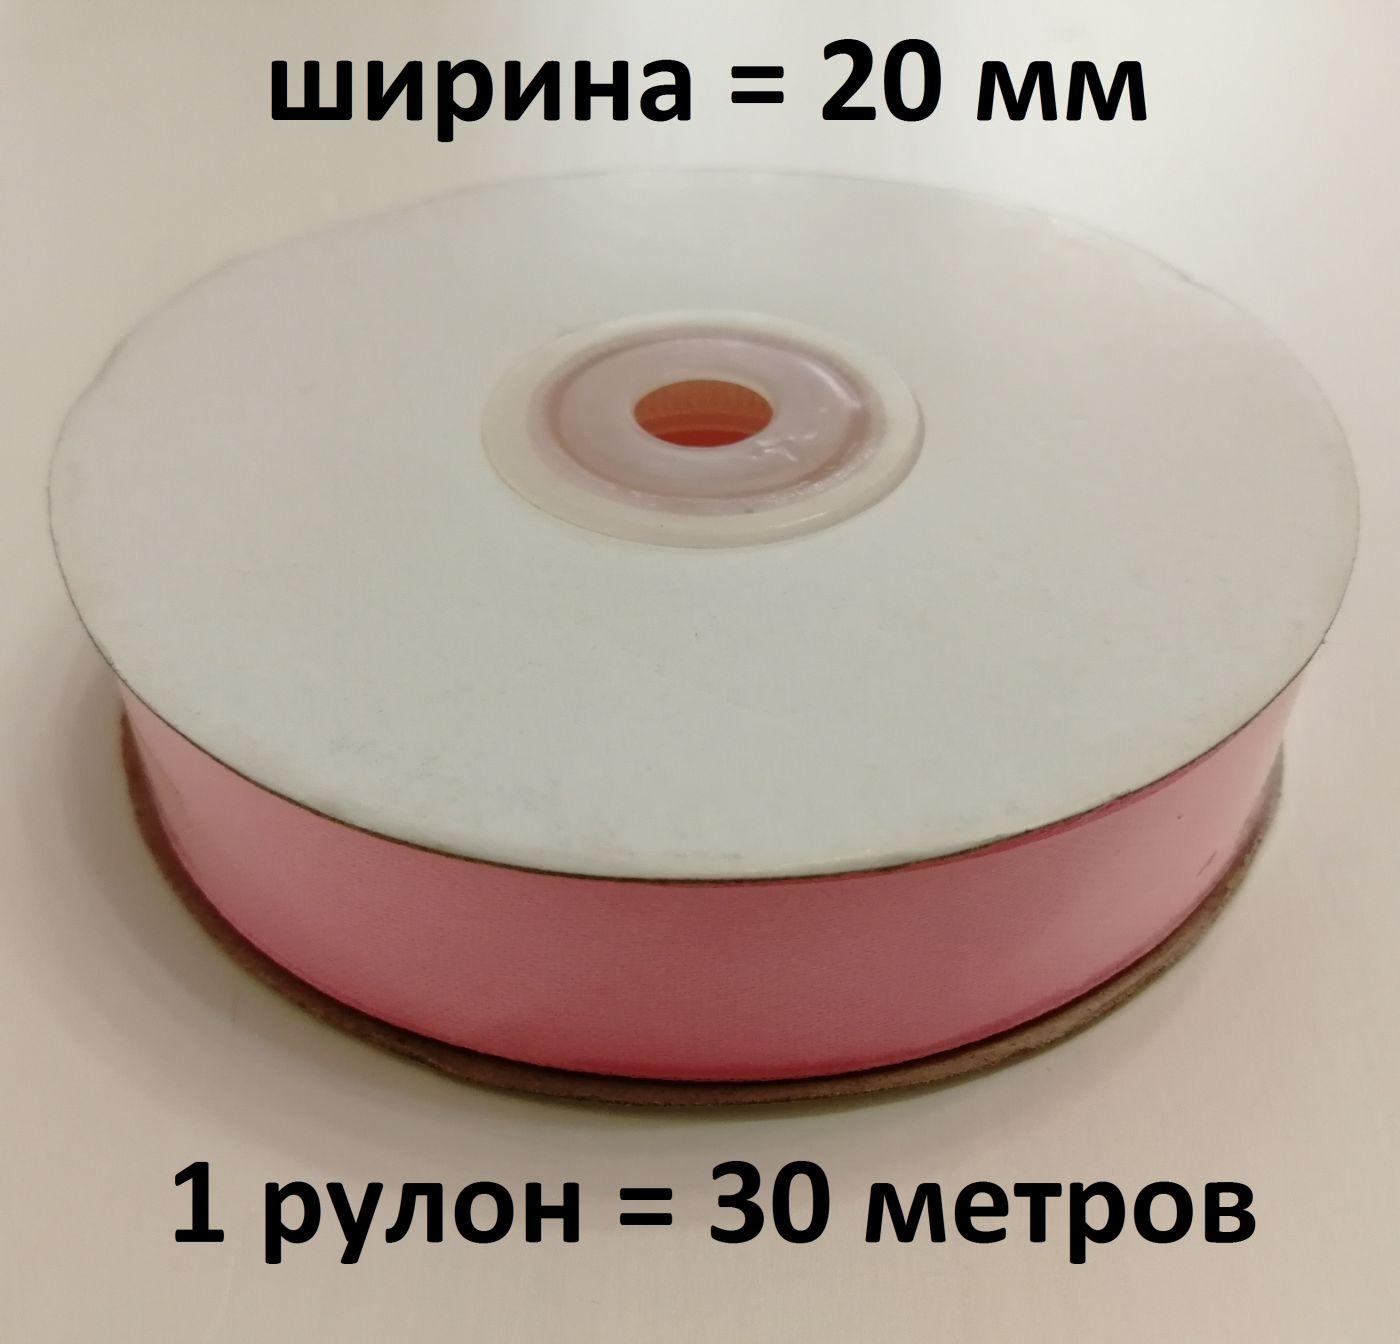 Лента атласная Идеал розовая ширина - 20 мм , длина - 30 метров